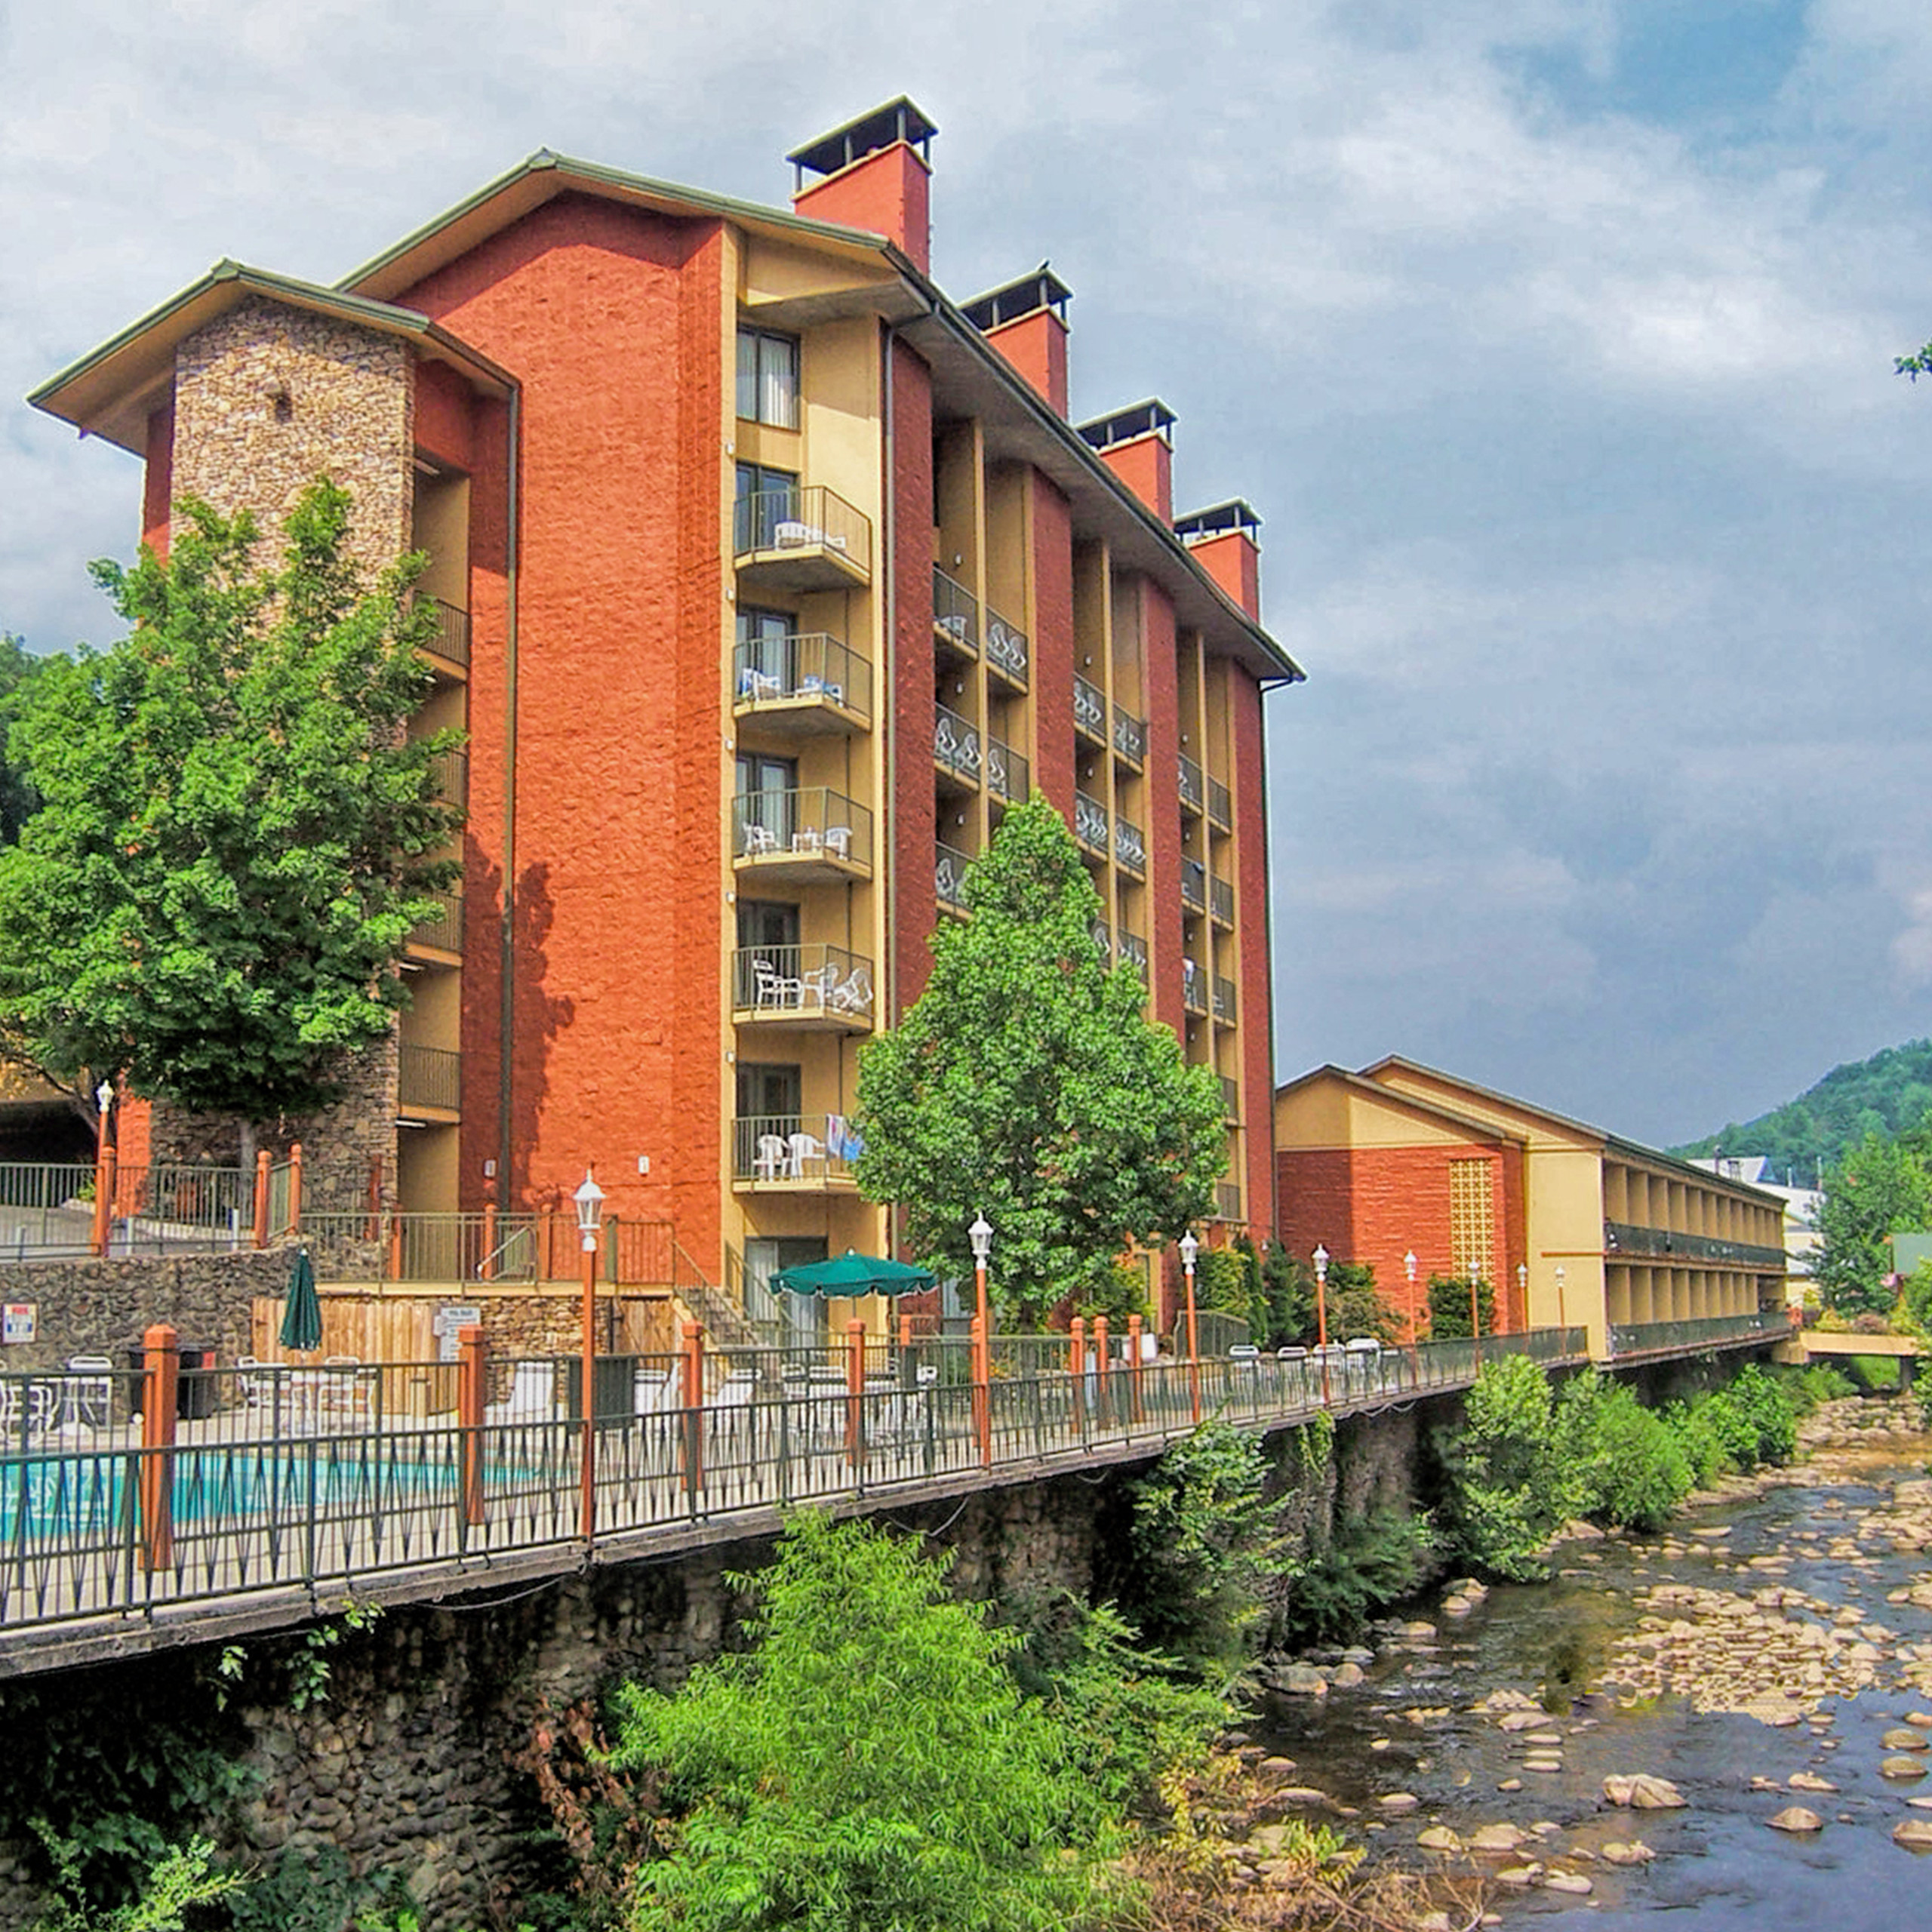 Download Your Favorite River Terrace Resort Wallpaper HERE!